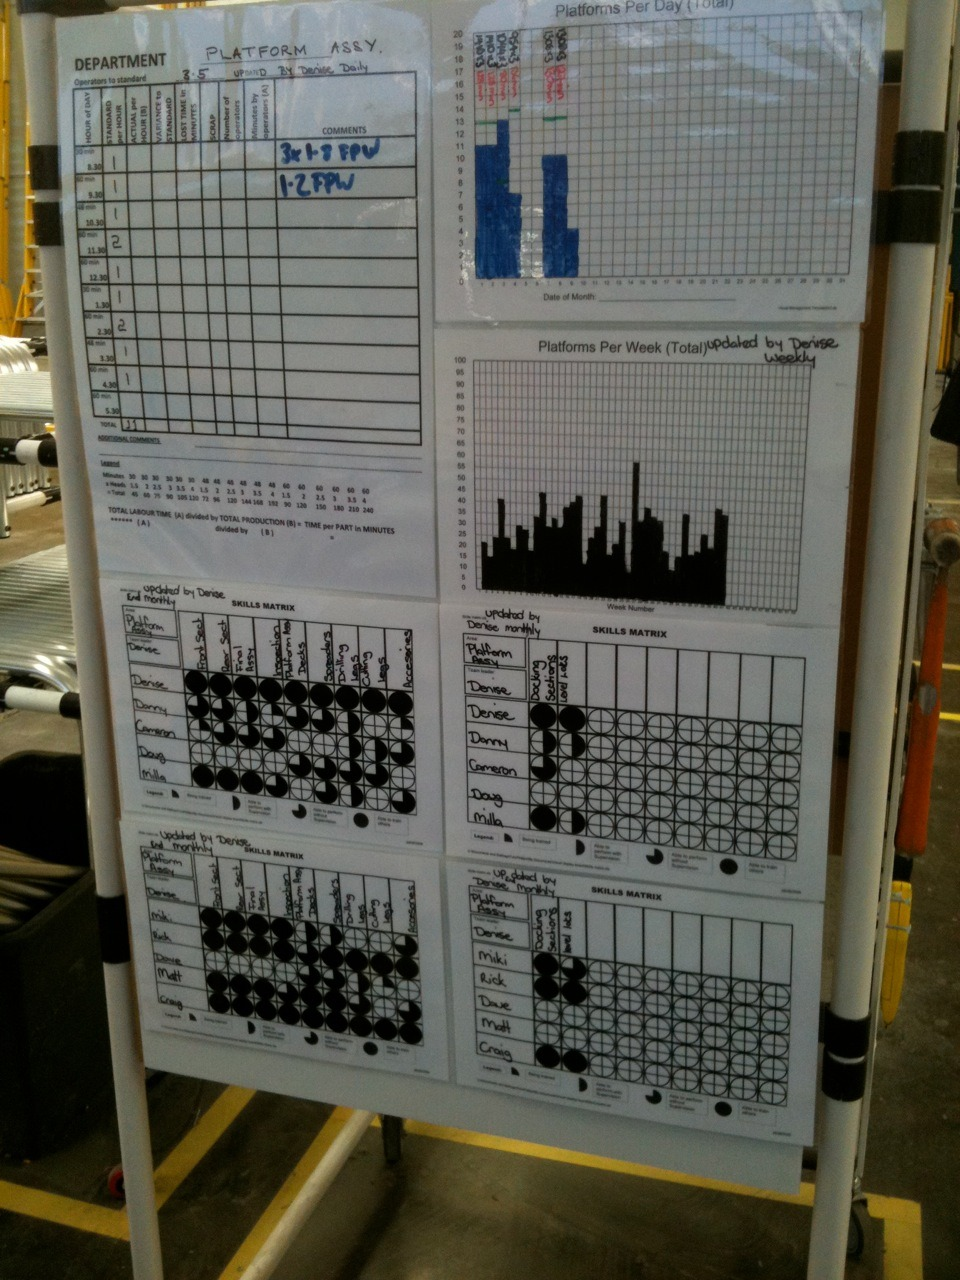 Branach Skills Matrix Photo